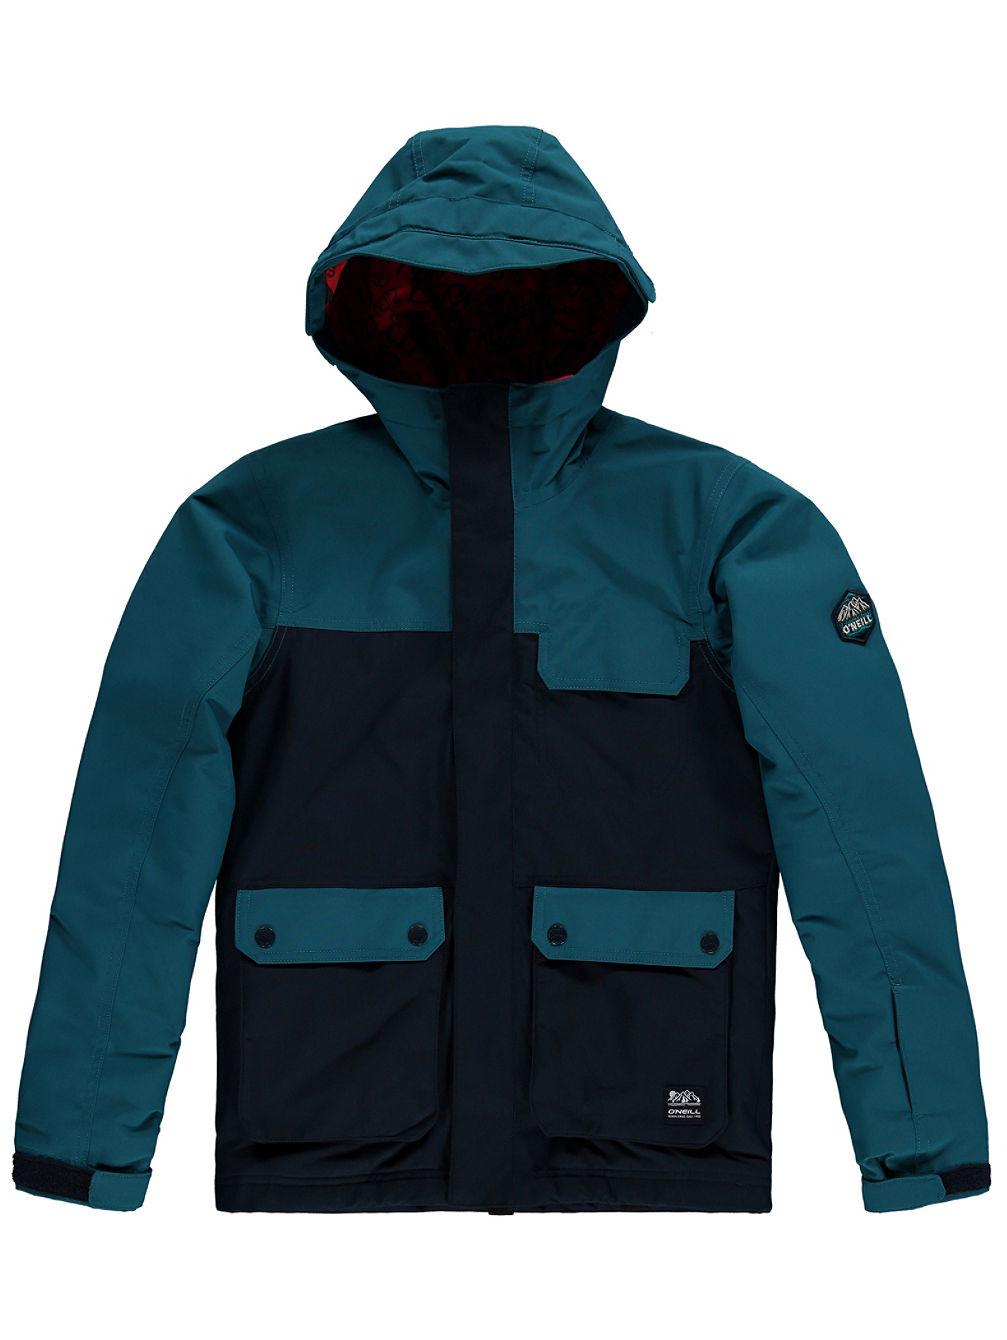 273729237 Buy O Neill Hawking Jacket Boys online at blue-tomato.com